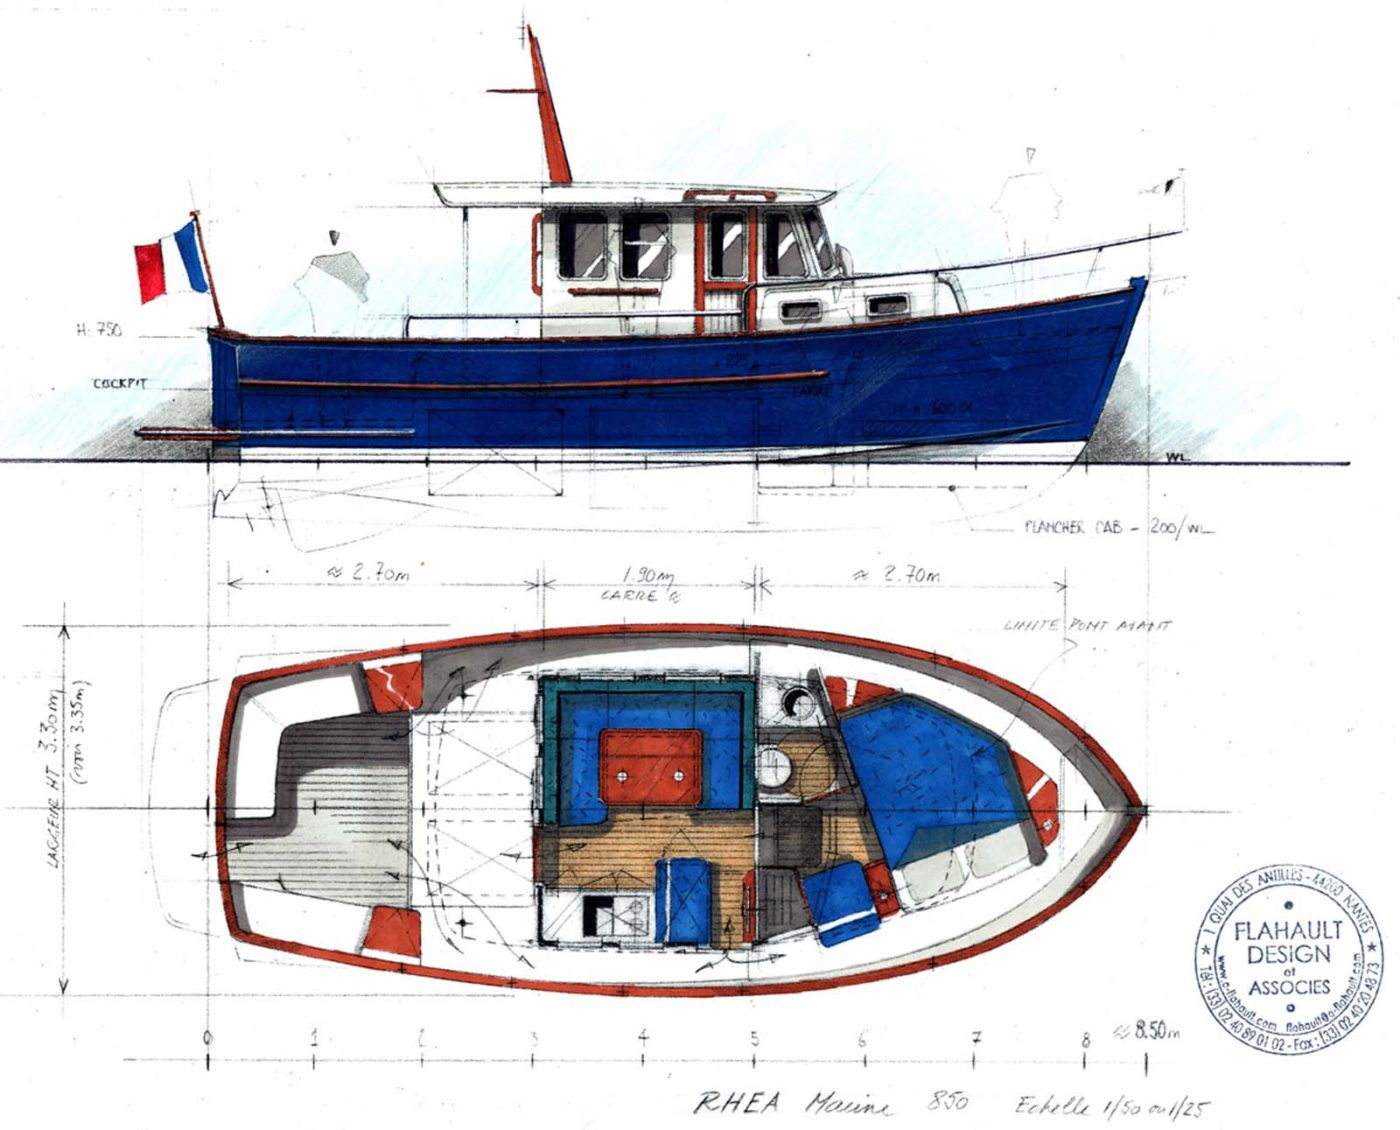 Rhea 850 Timonier Diagram